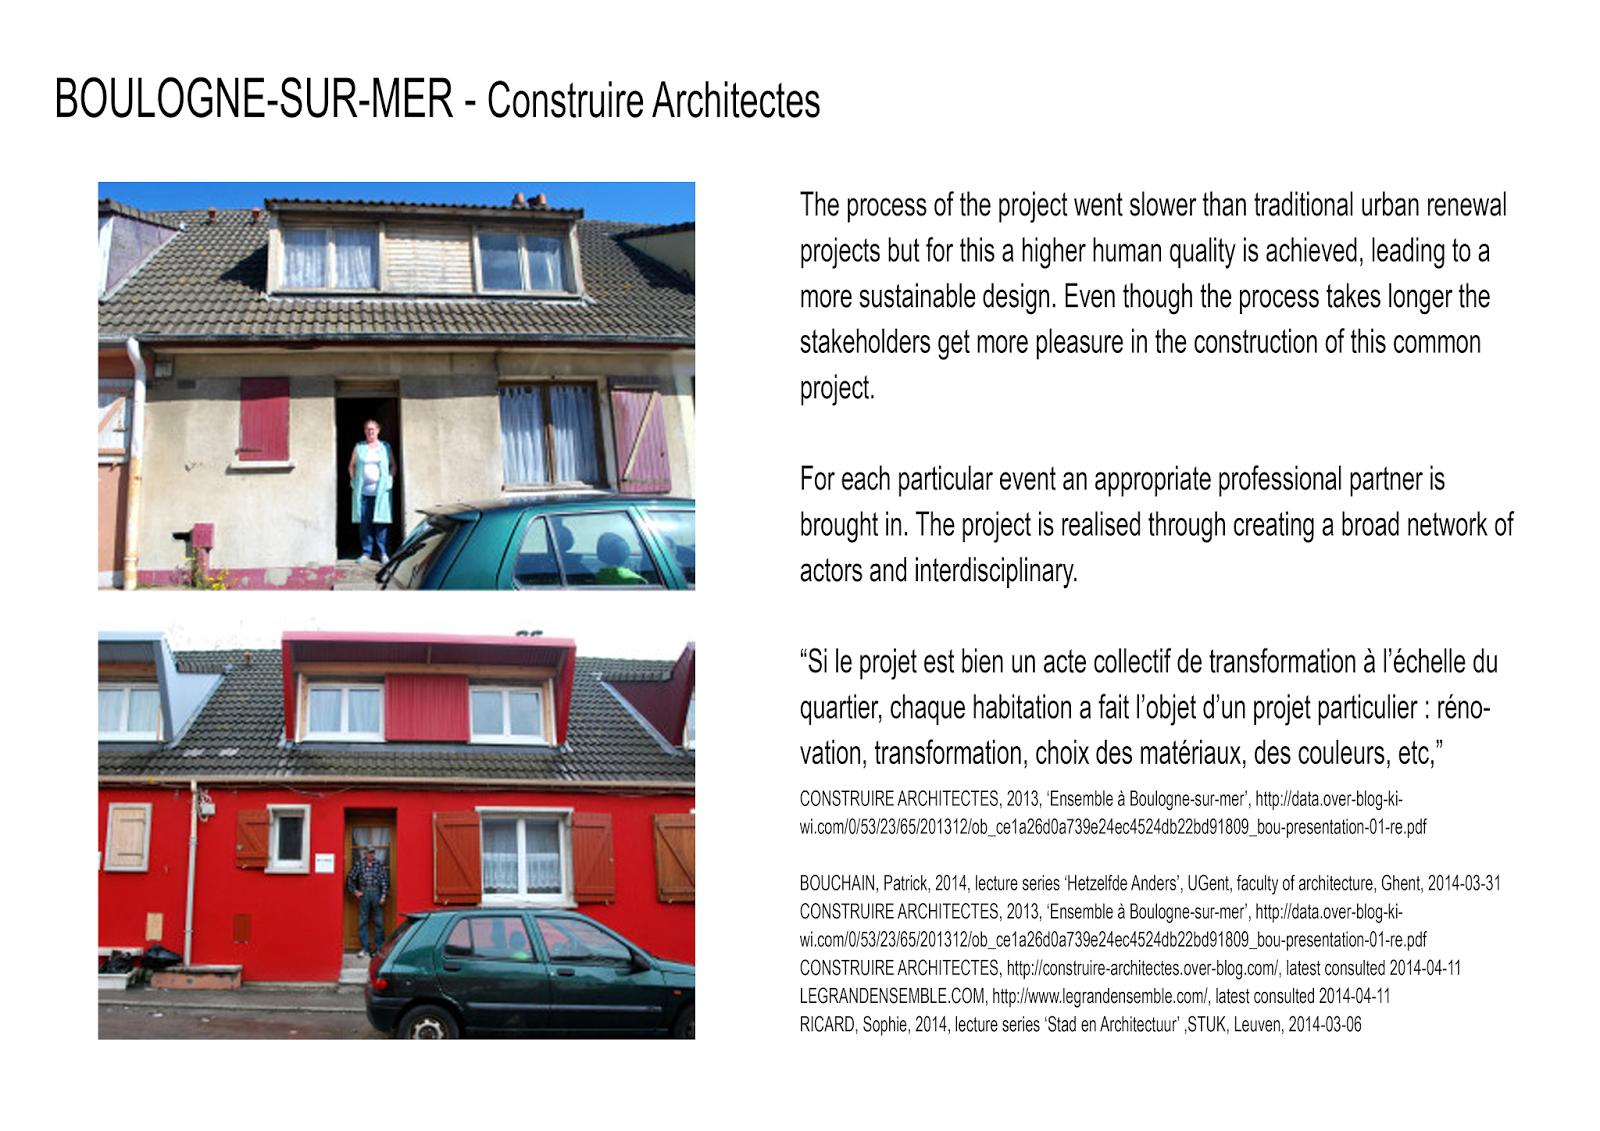 construire architectes ensemble boulogne sur mer within rabot. Black Bedroom Furniture Sets. Home Design Ideas